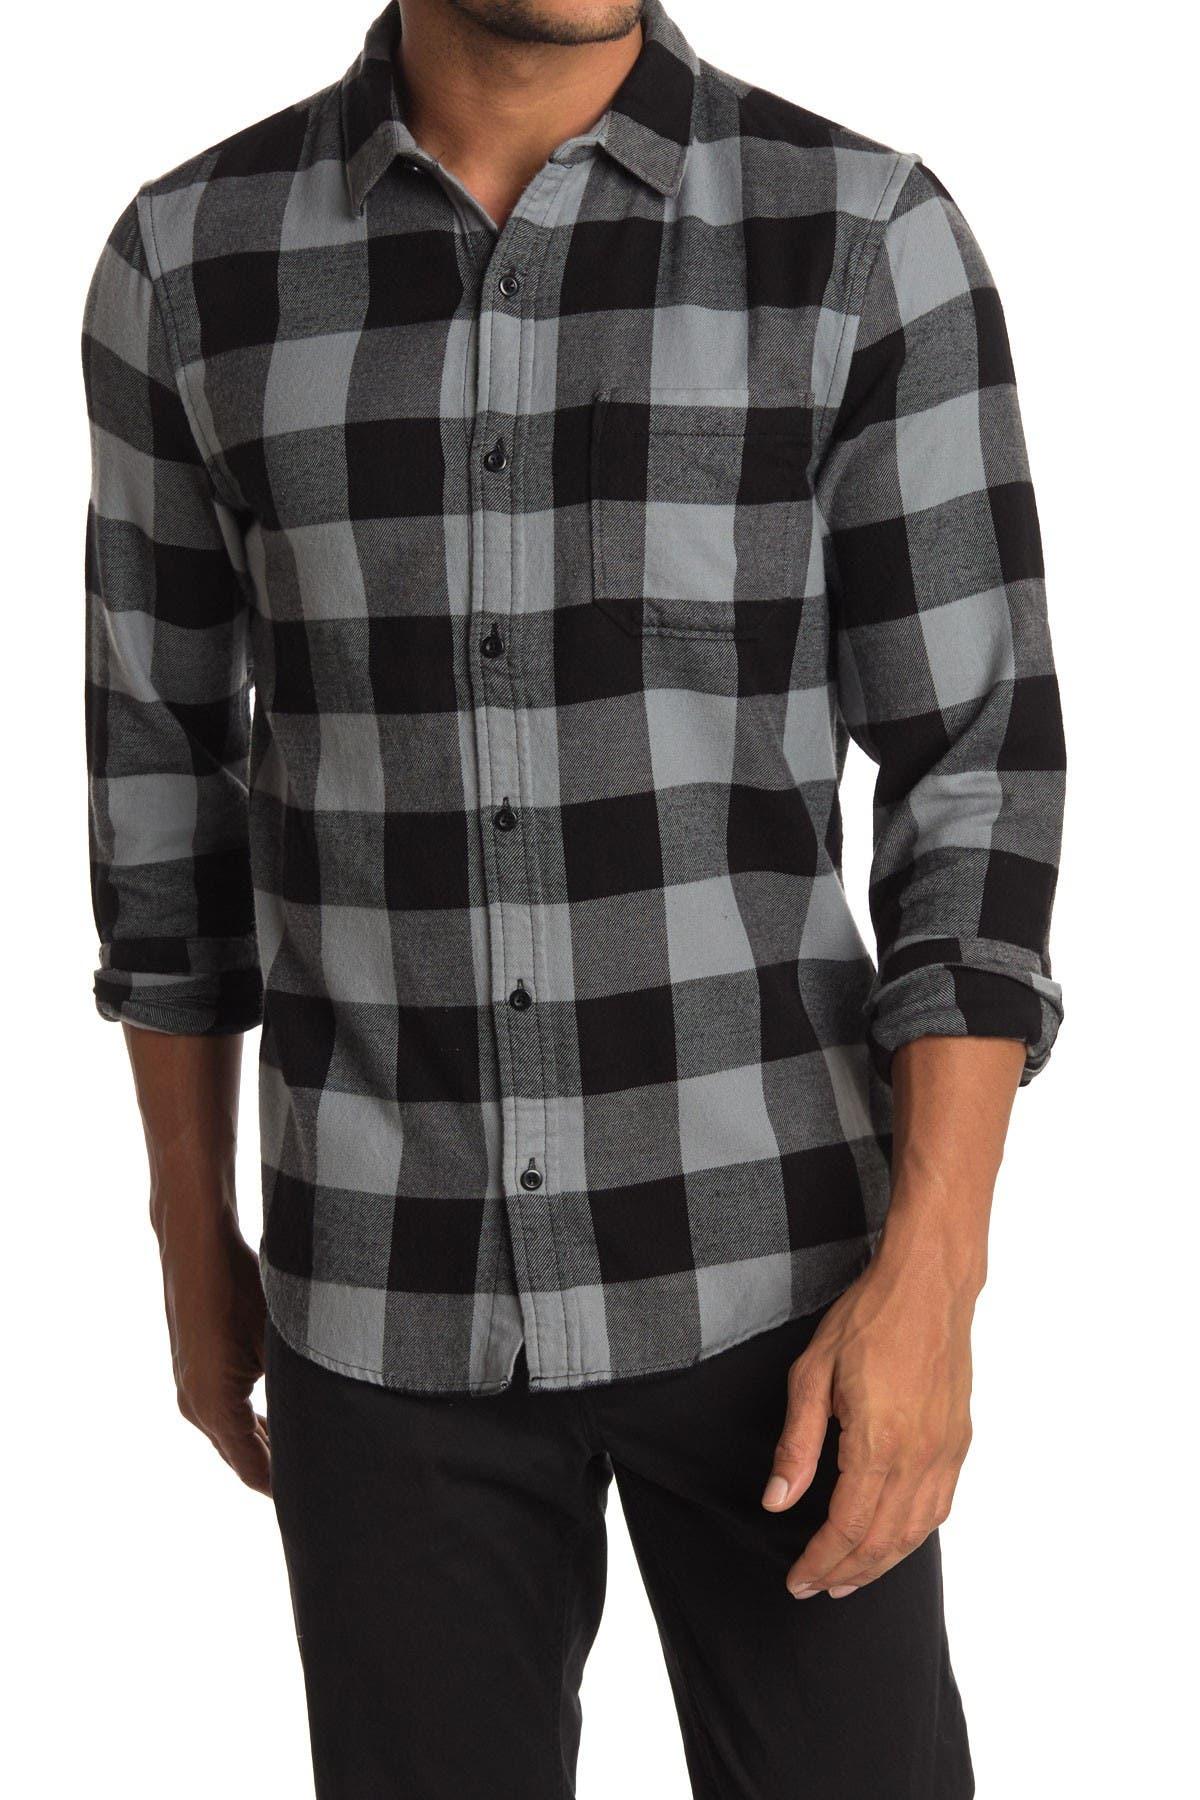 Image of Public Opinion Bufflo Plaid Flannel Shirt